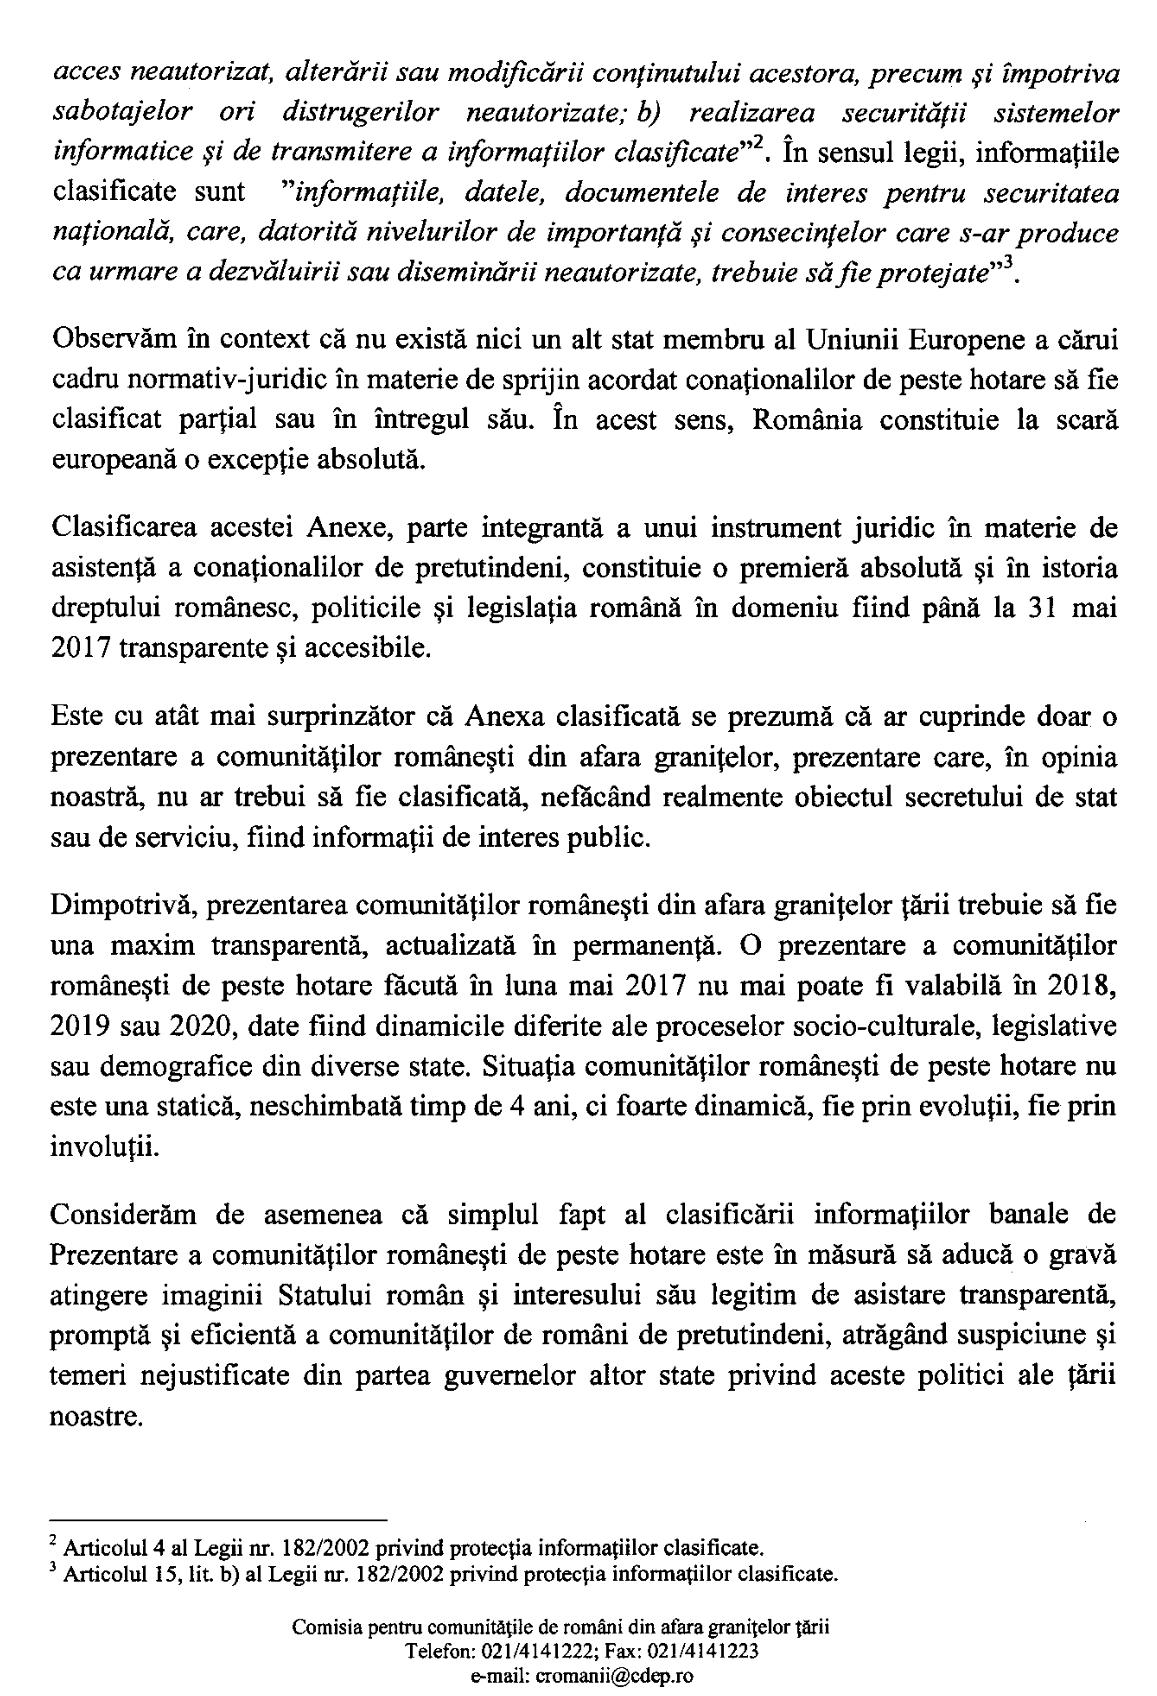 Interpelare Constantin Codreanu Parlament